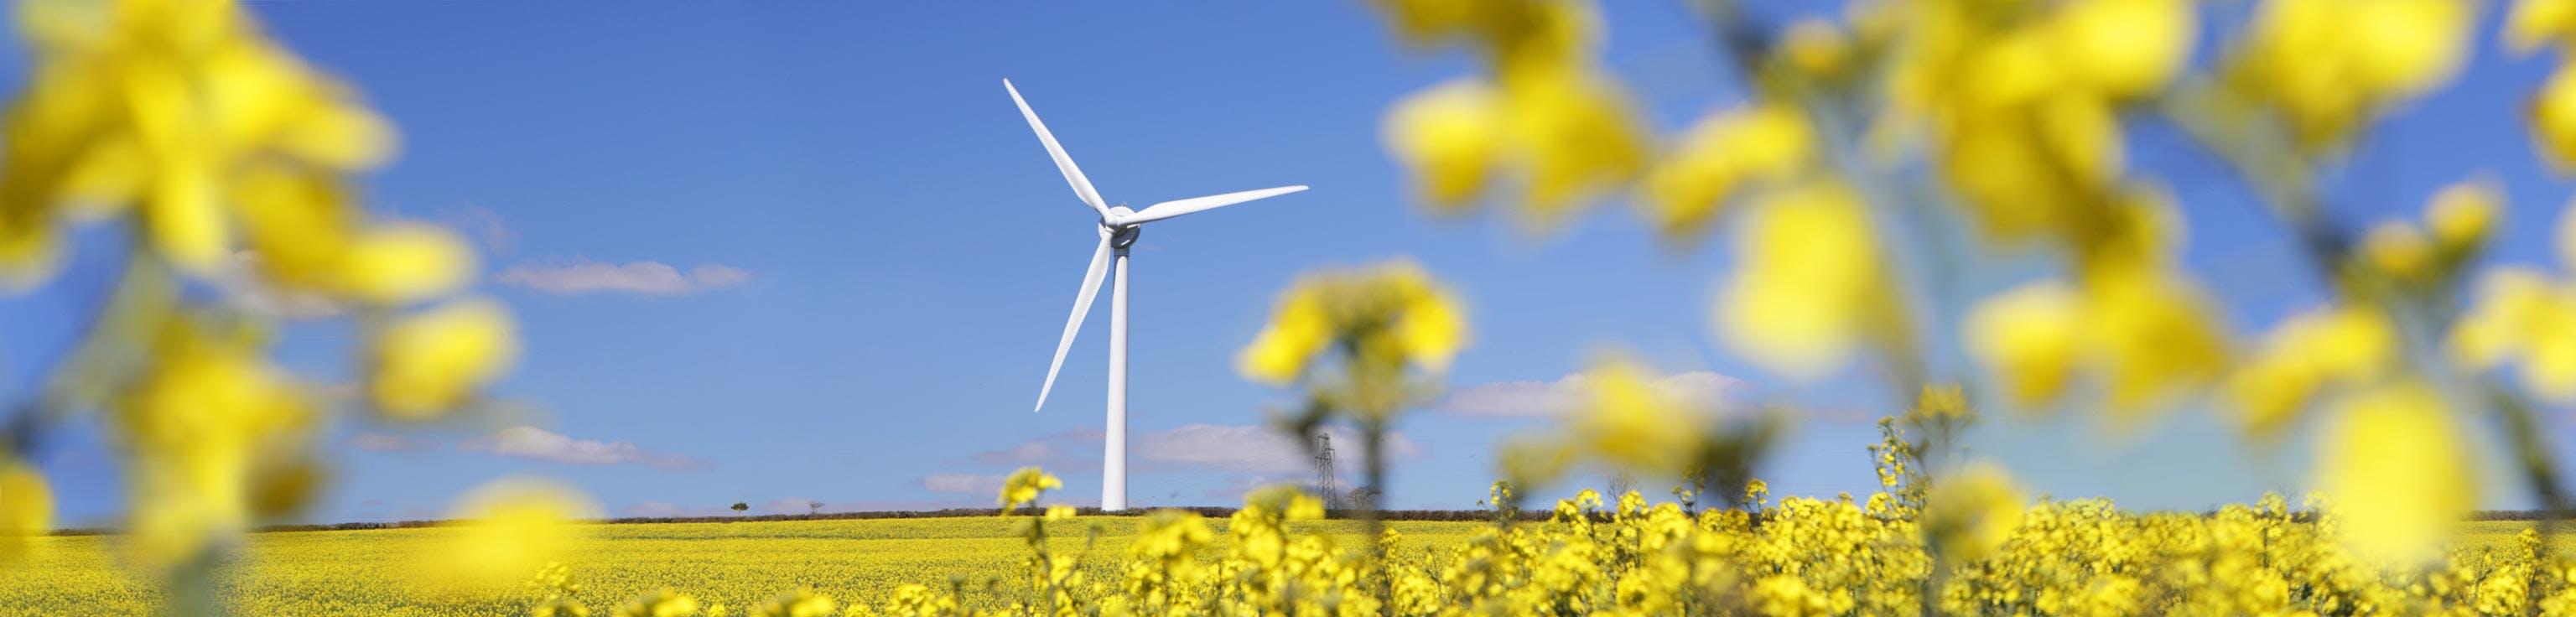 Windmill in a field of yellow flowers